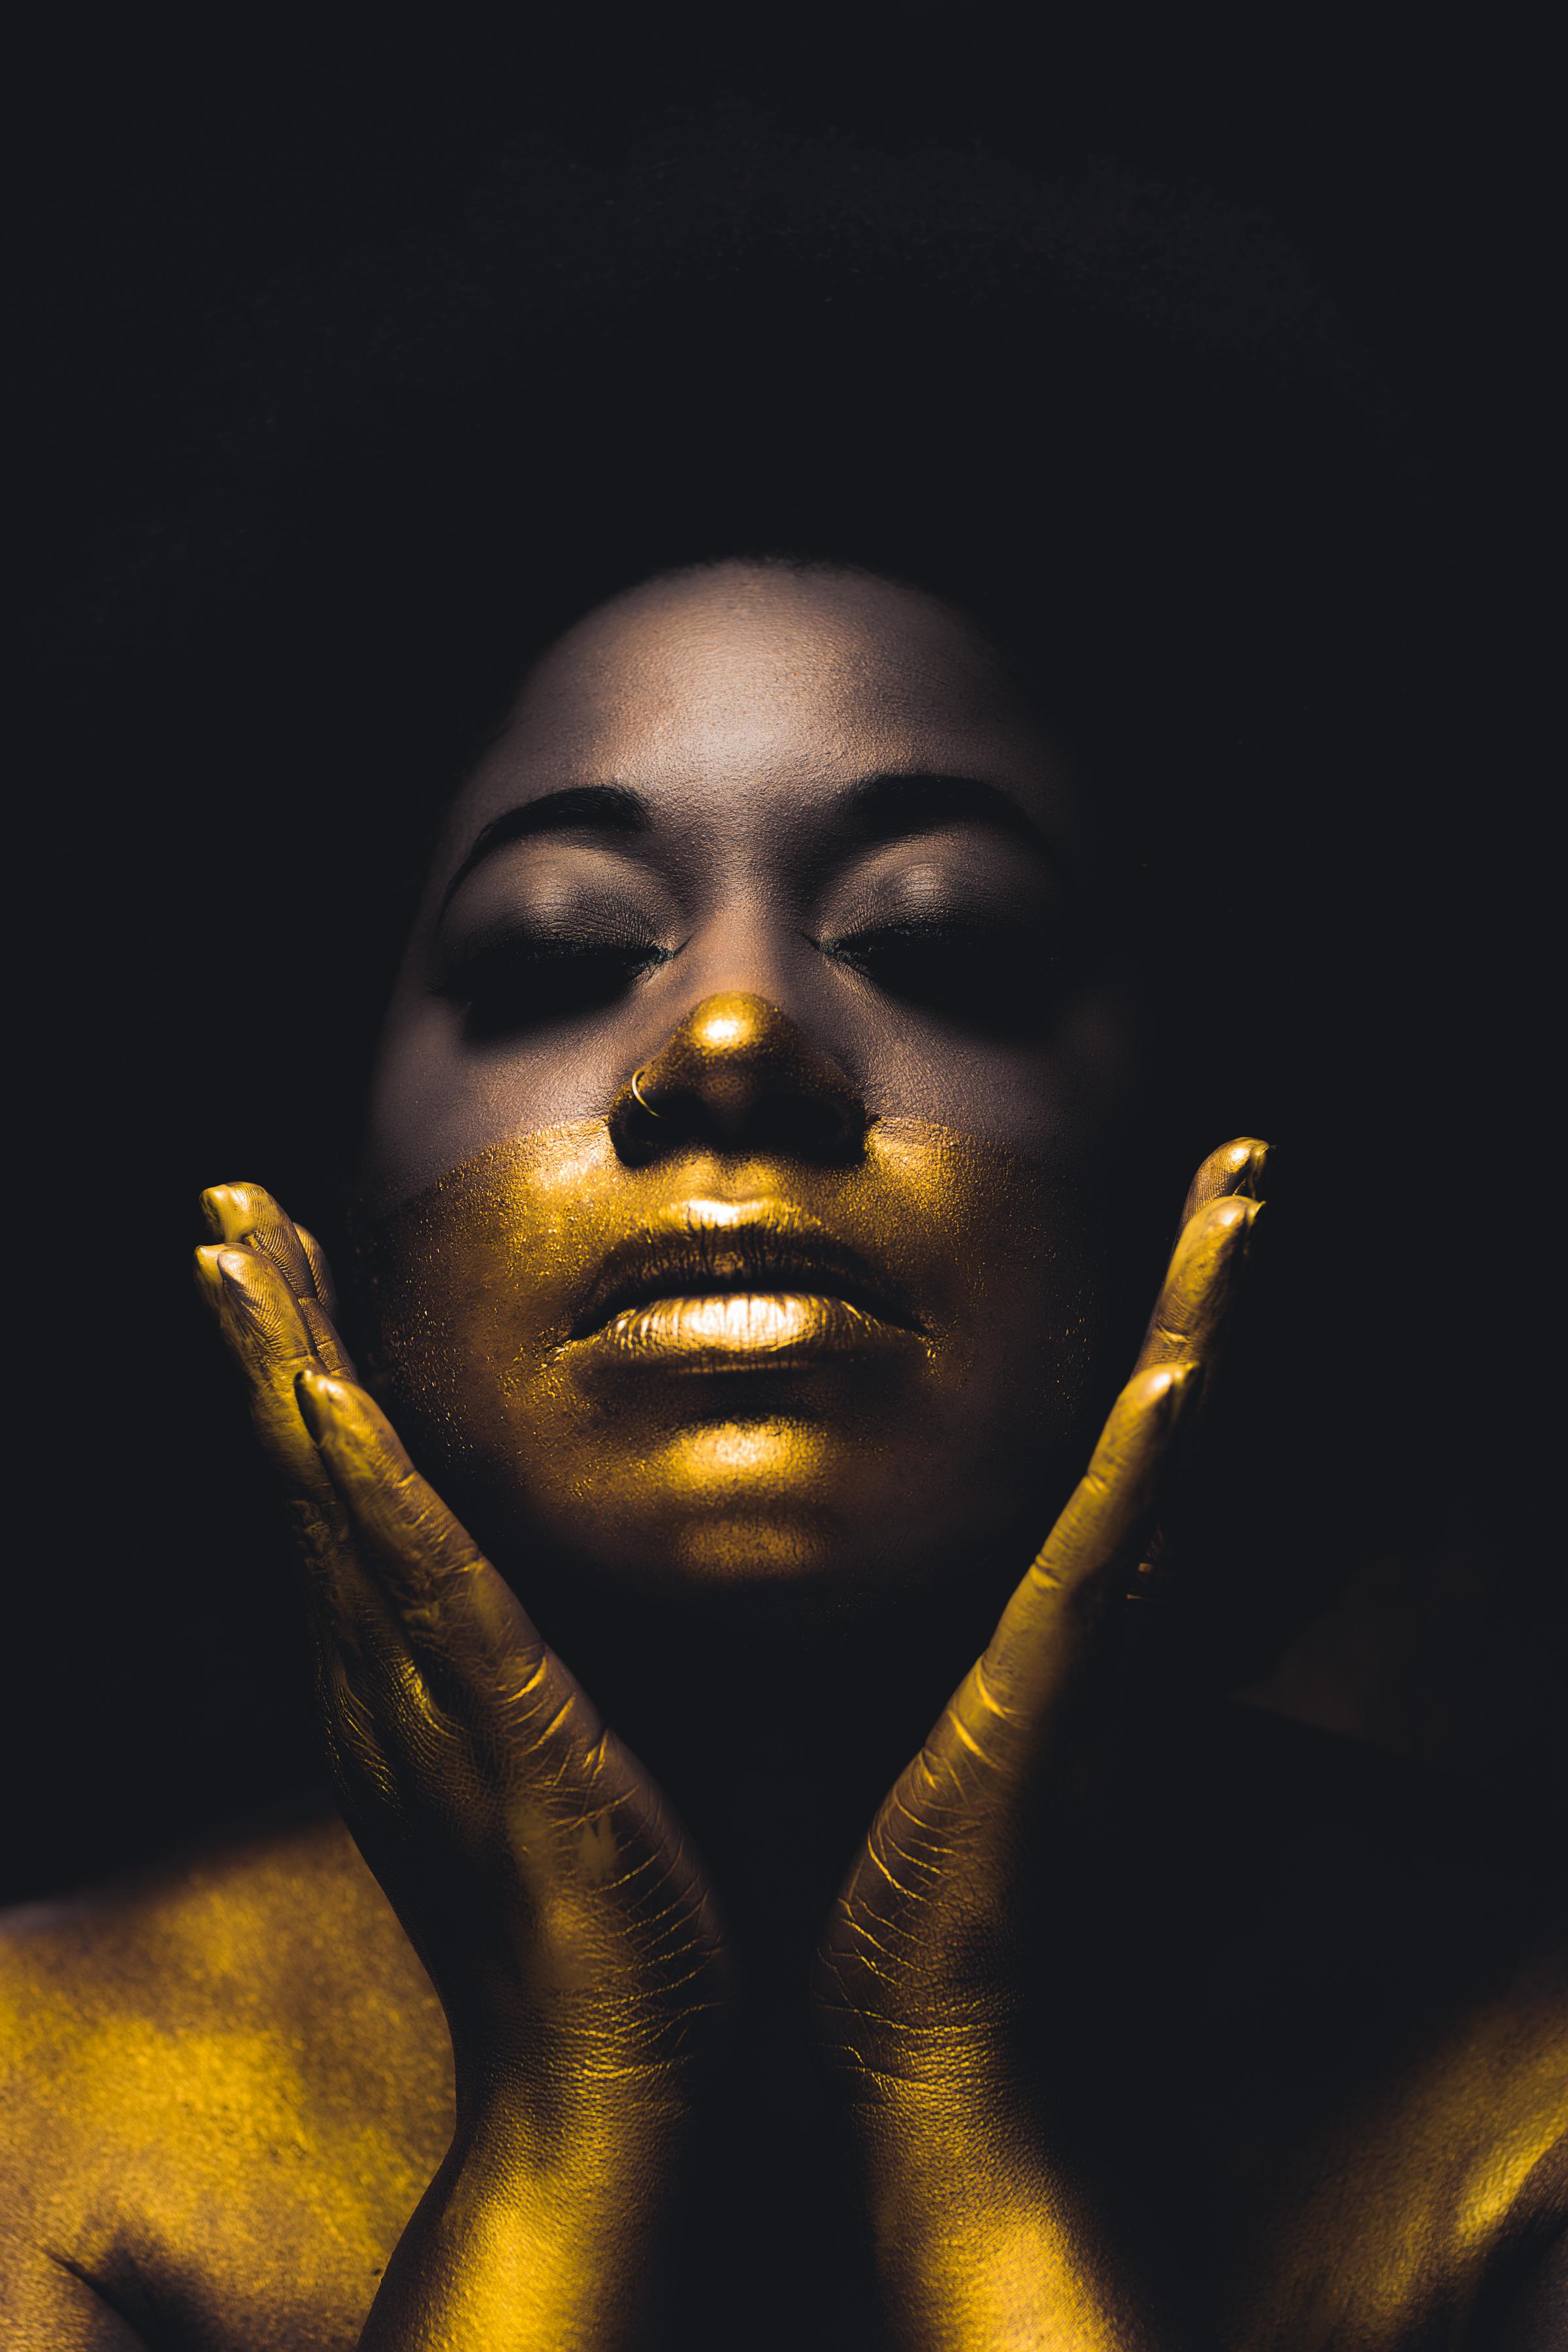 Futuristic Black Women Series